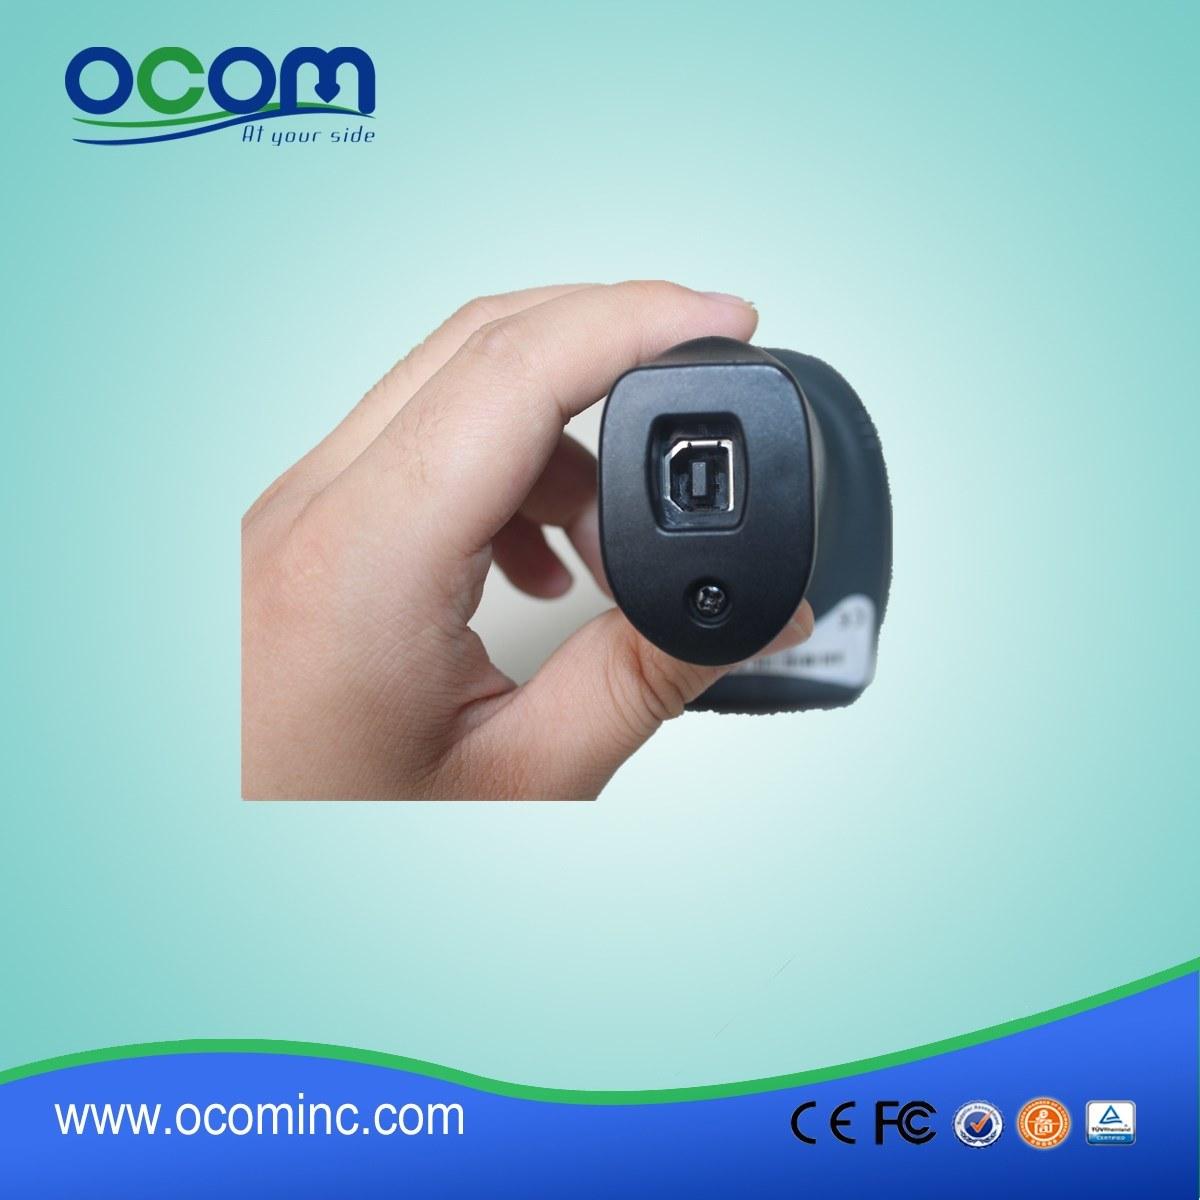 Ocbs-W010 2.4G Hz Wireless Laser Barcode Scanner with Optional Wired Mode